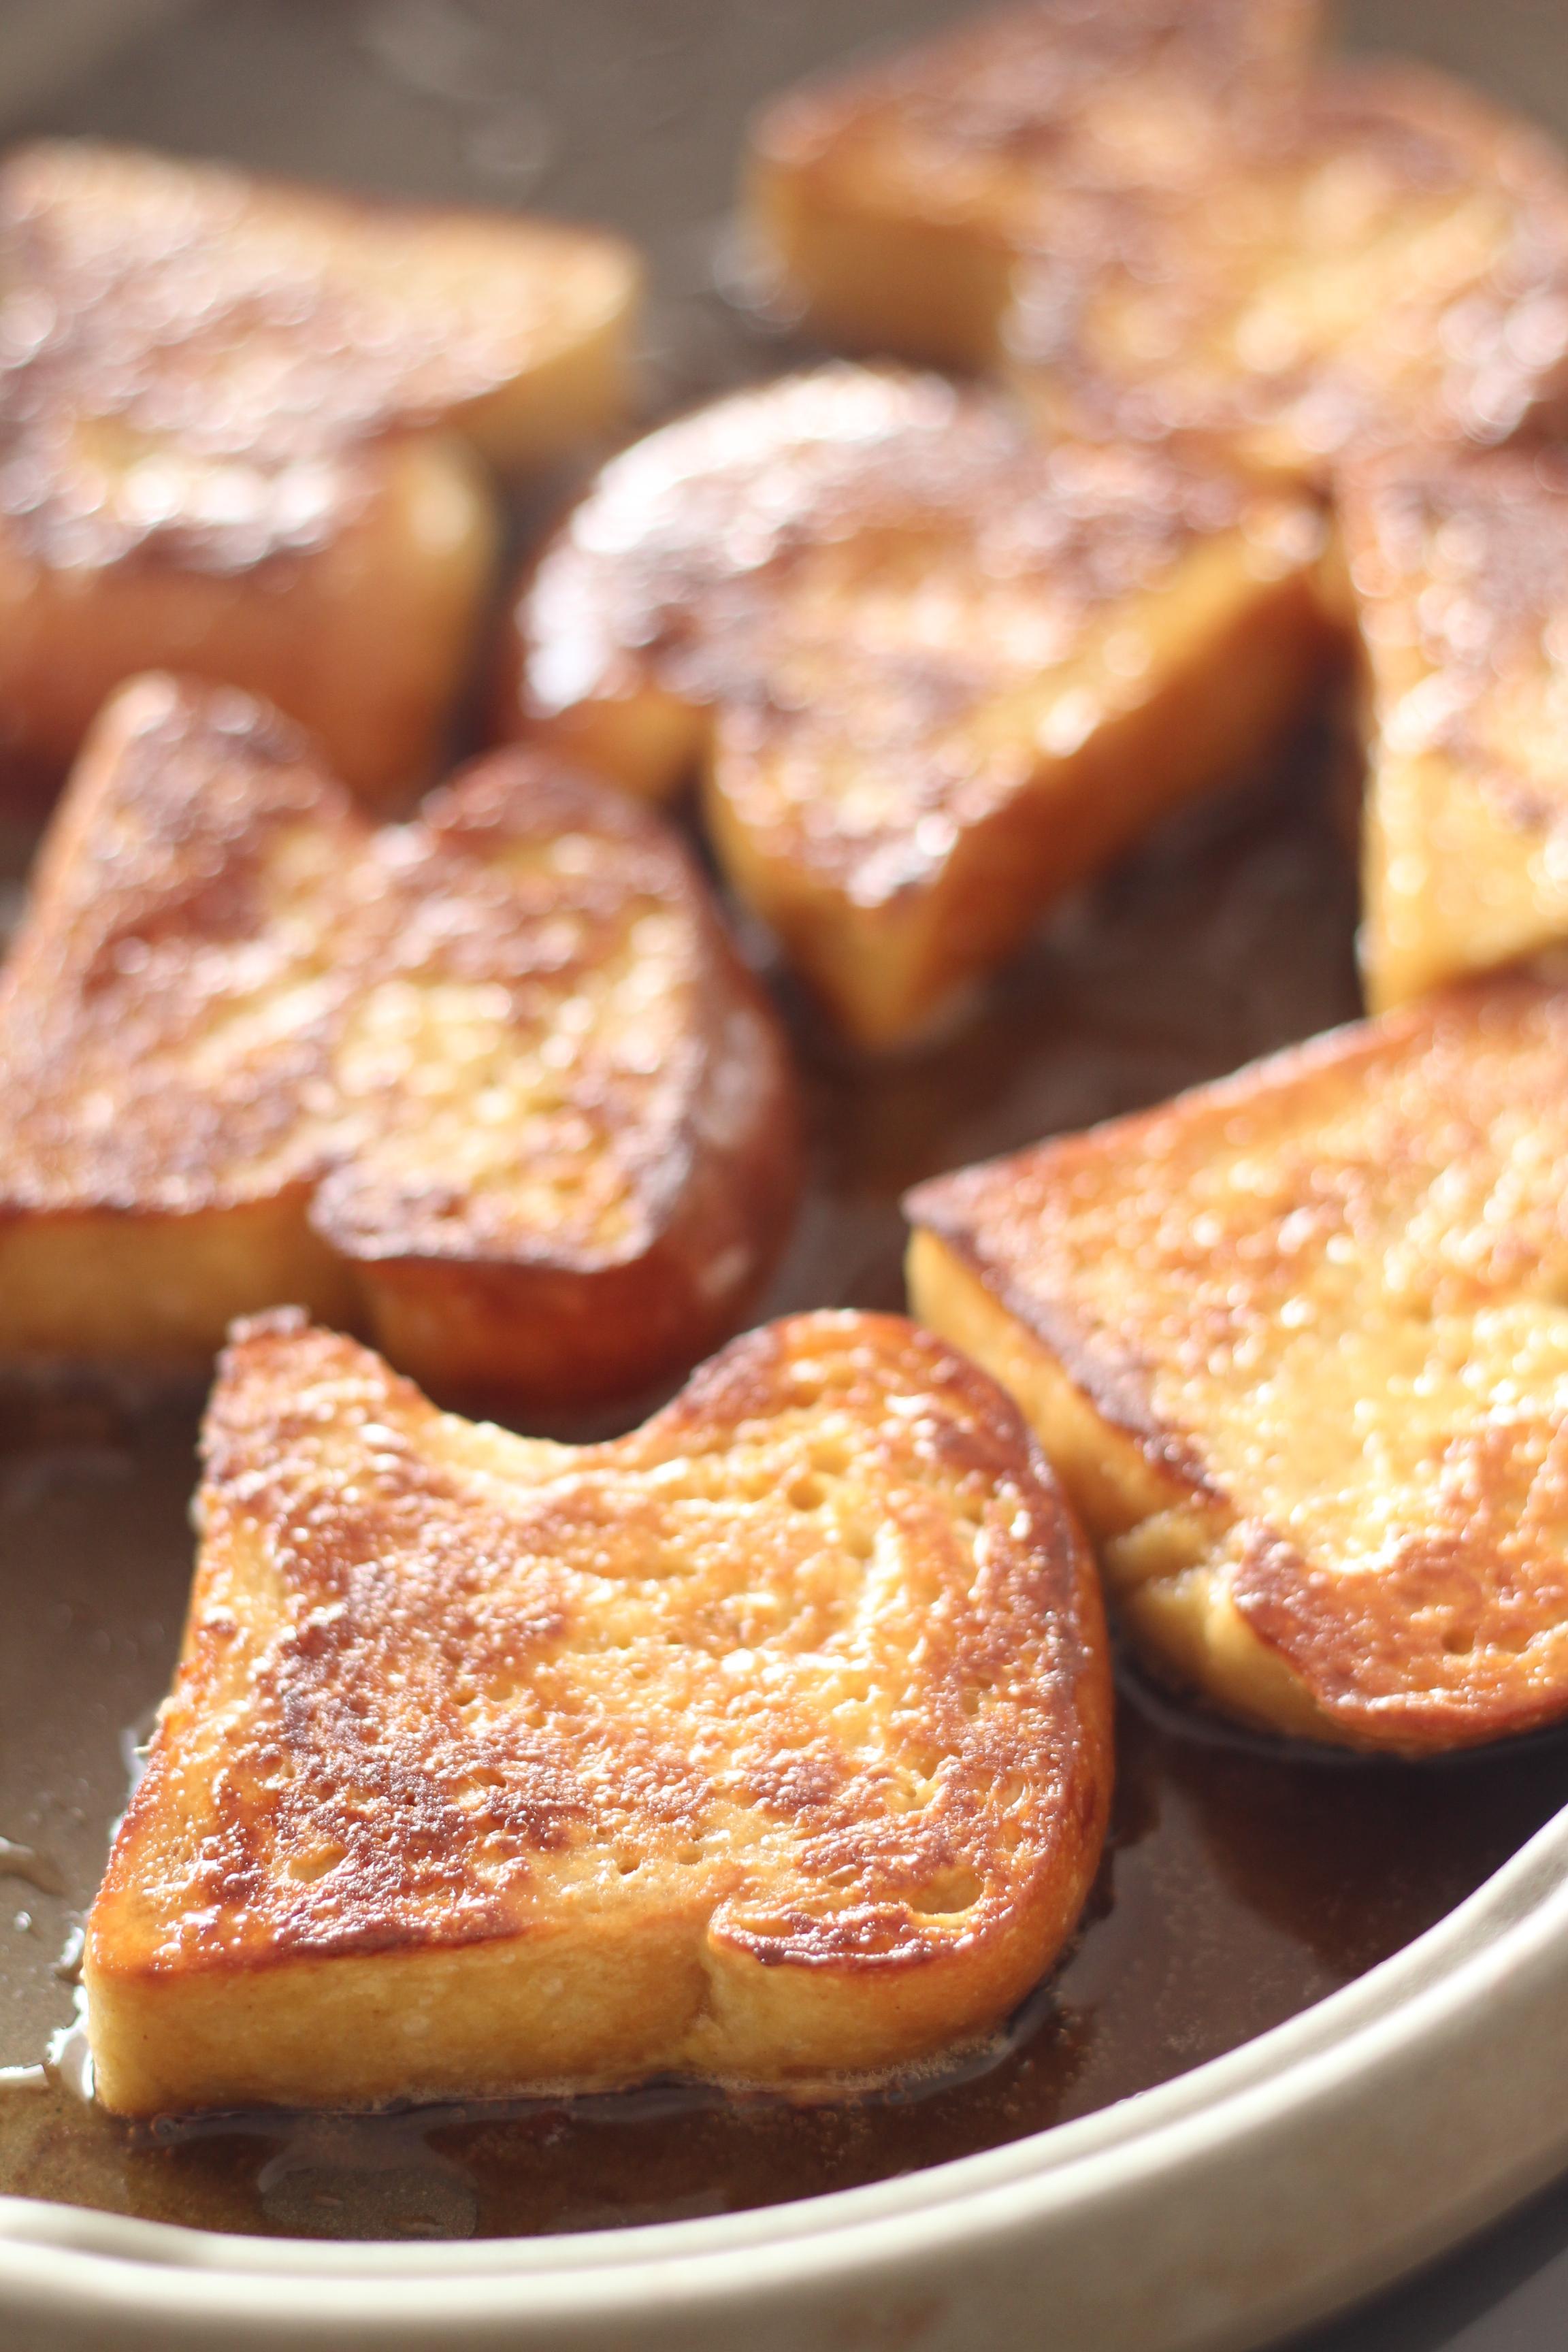 a-ta-sante糖質制限パン料理教室。阿倍野区西田辺。京都江部粉糖質制限トルティーヤにカレーを挟んで、フレンチトーストでランチ。